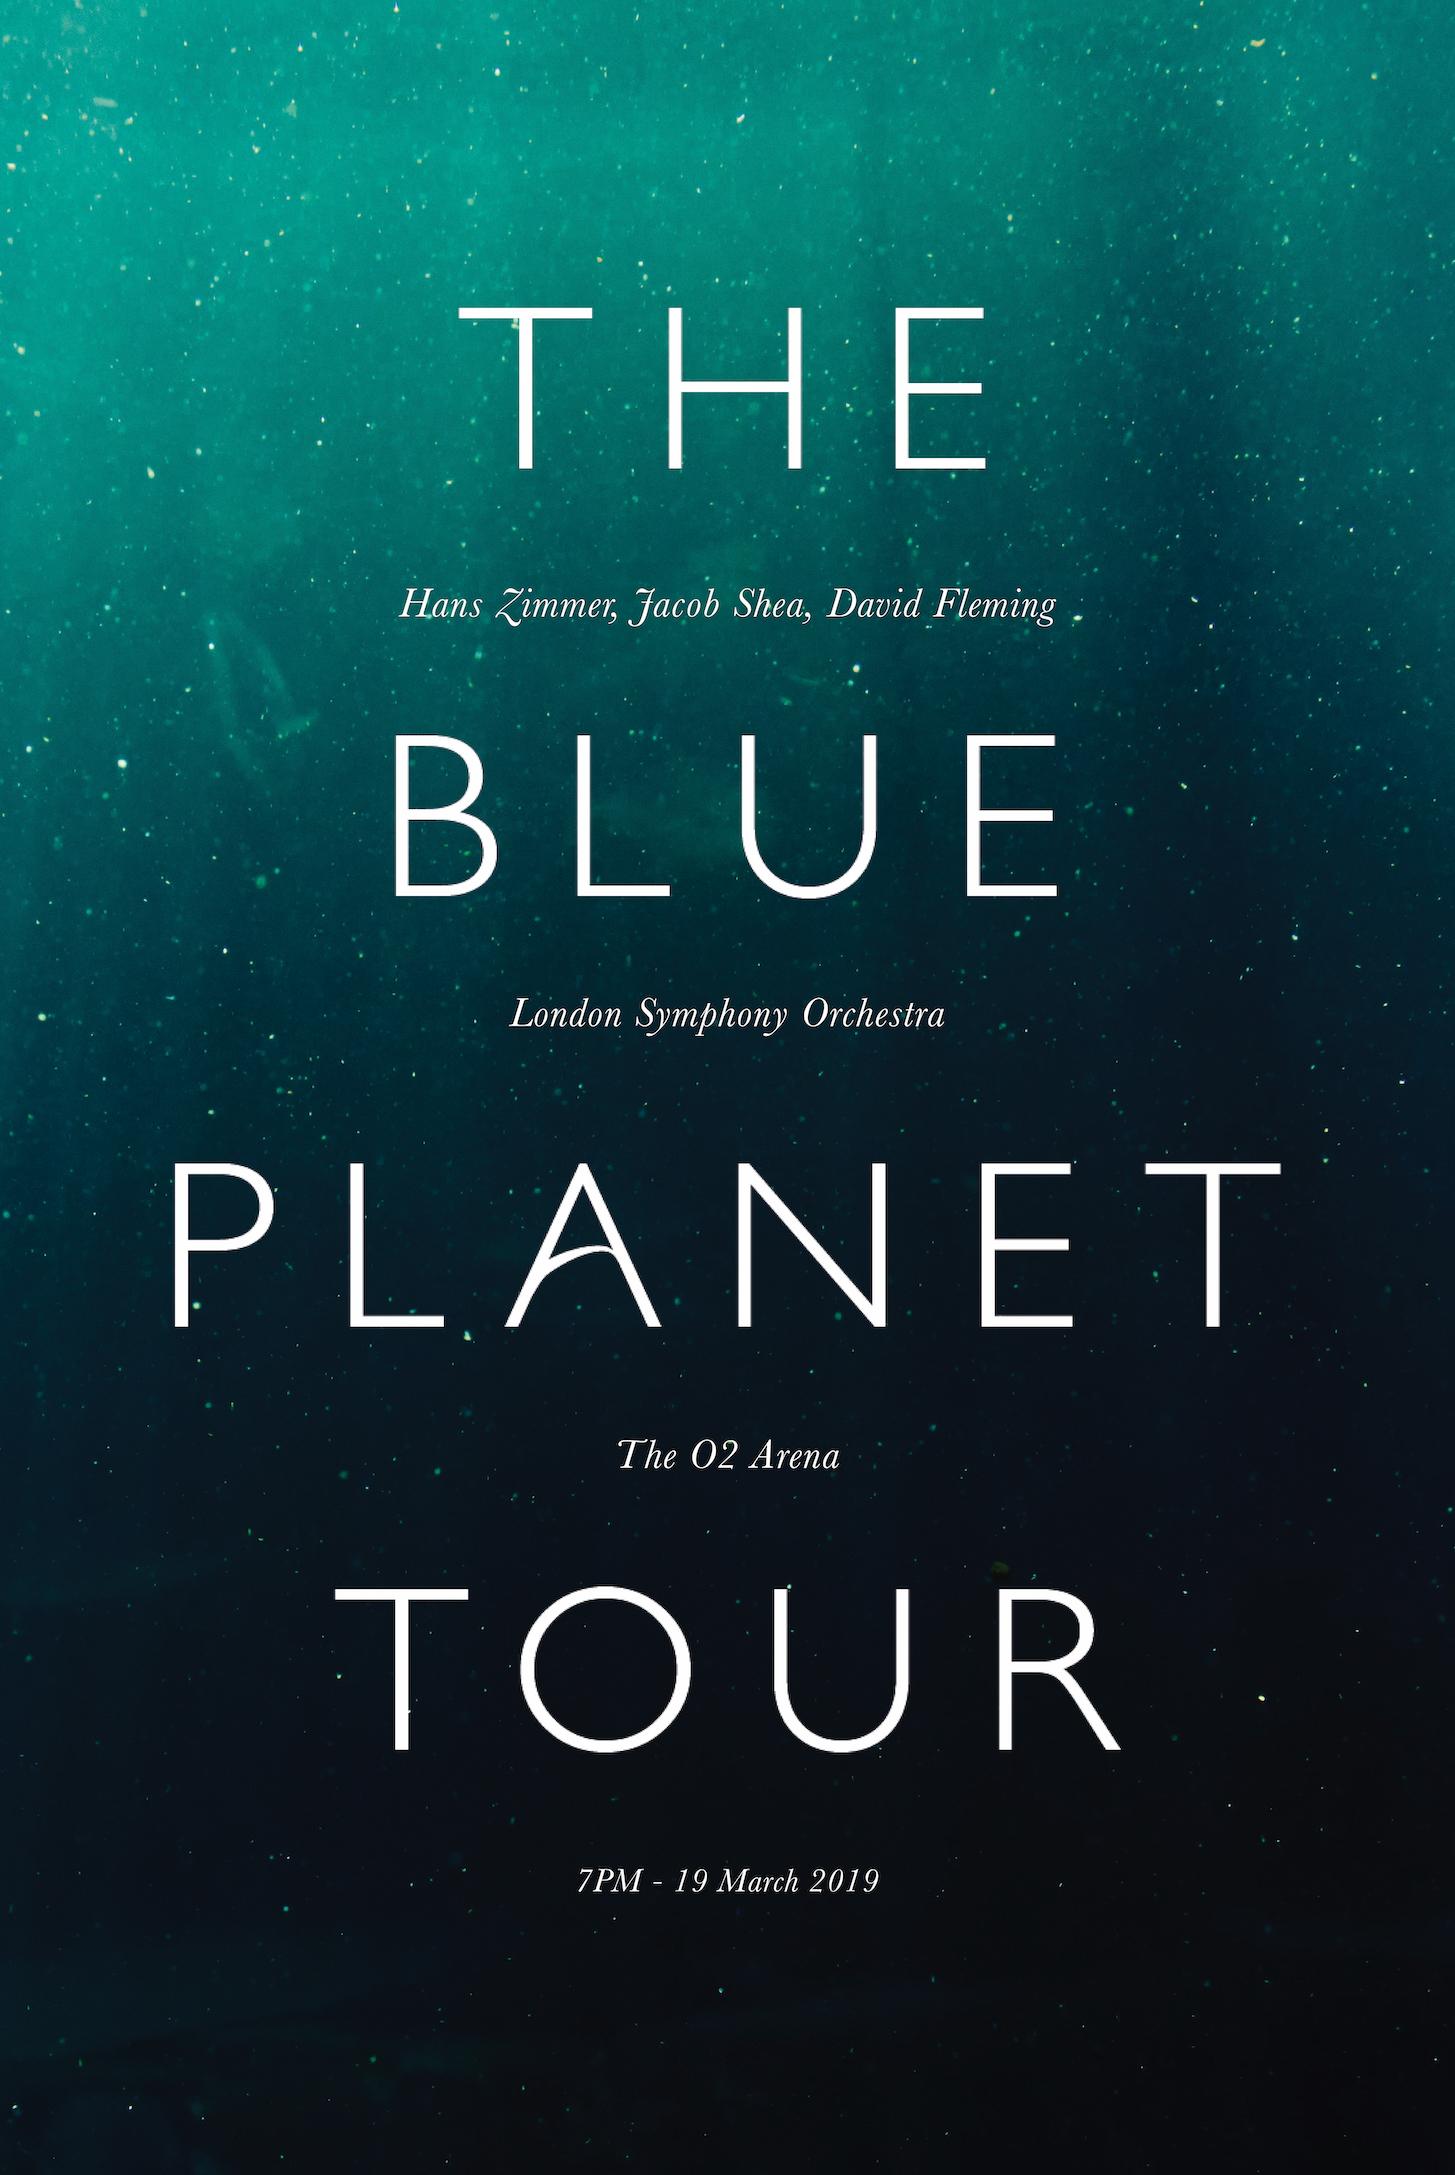 * BluePlanet_Posters-10 copy.jpg